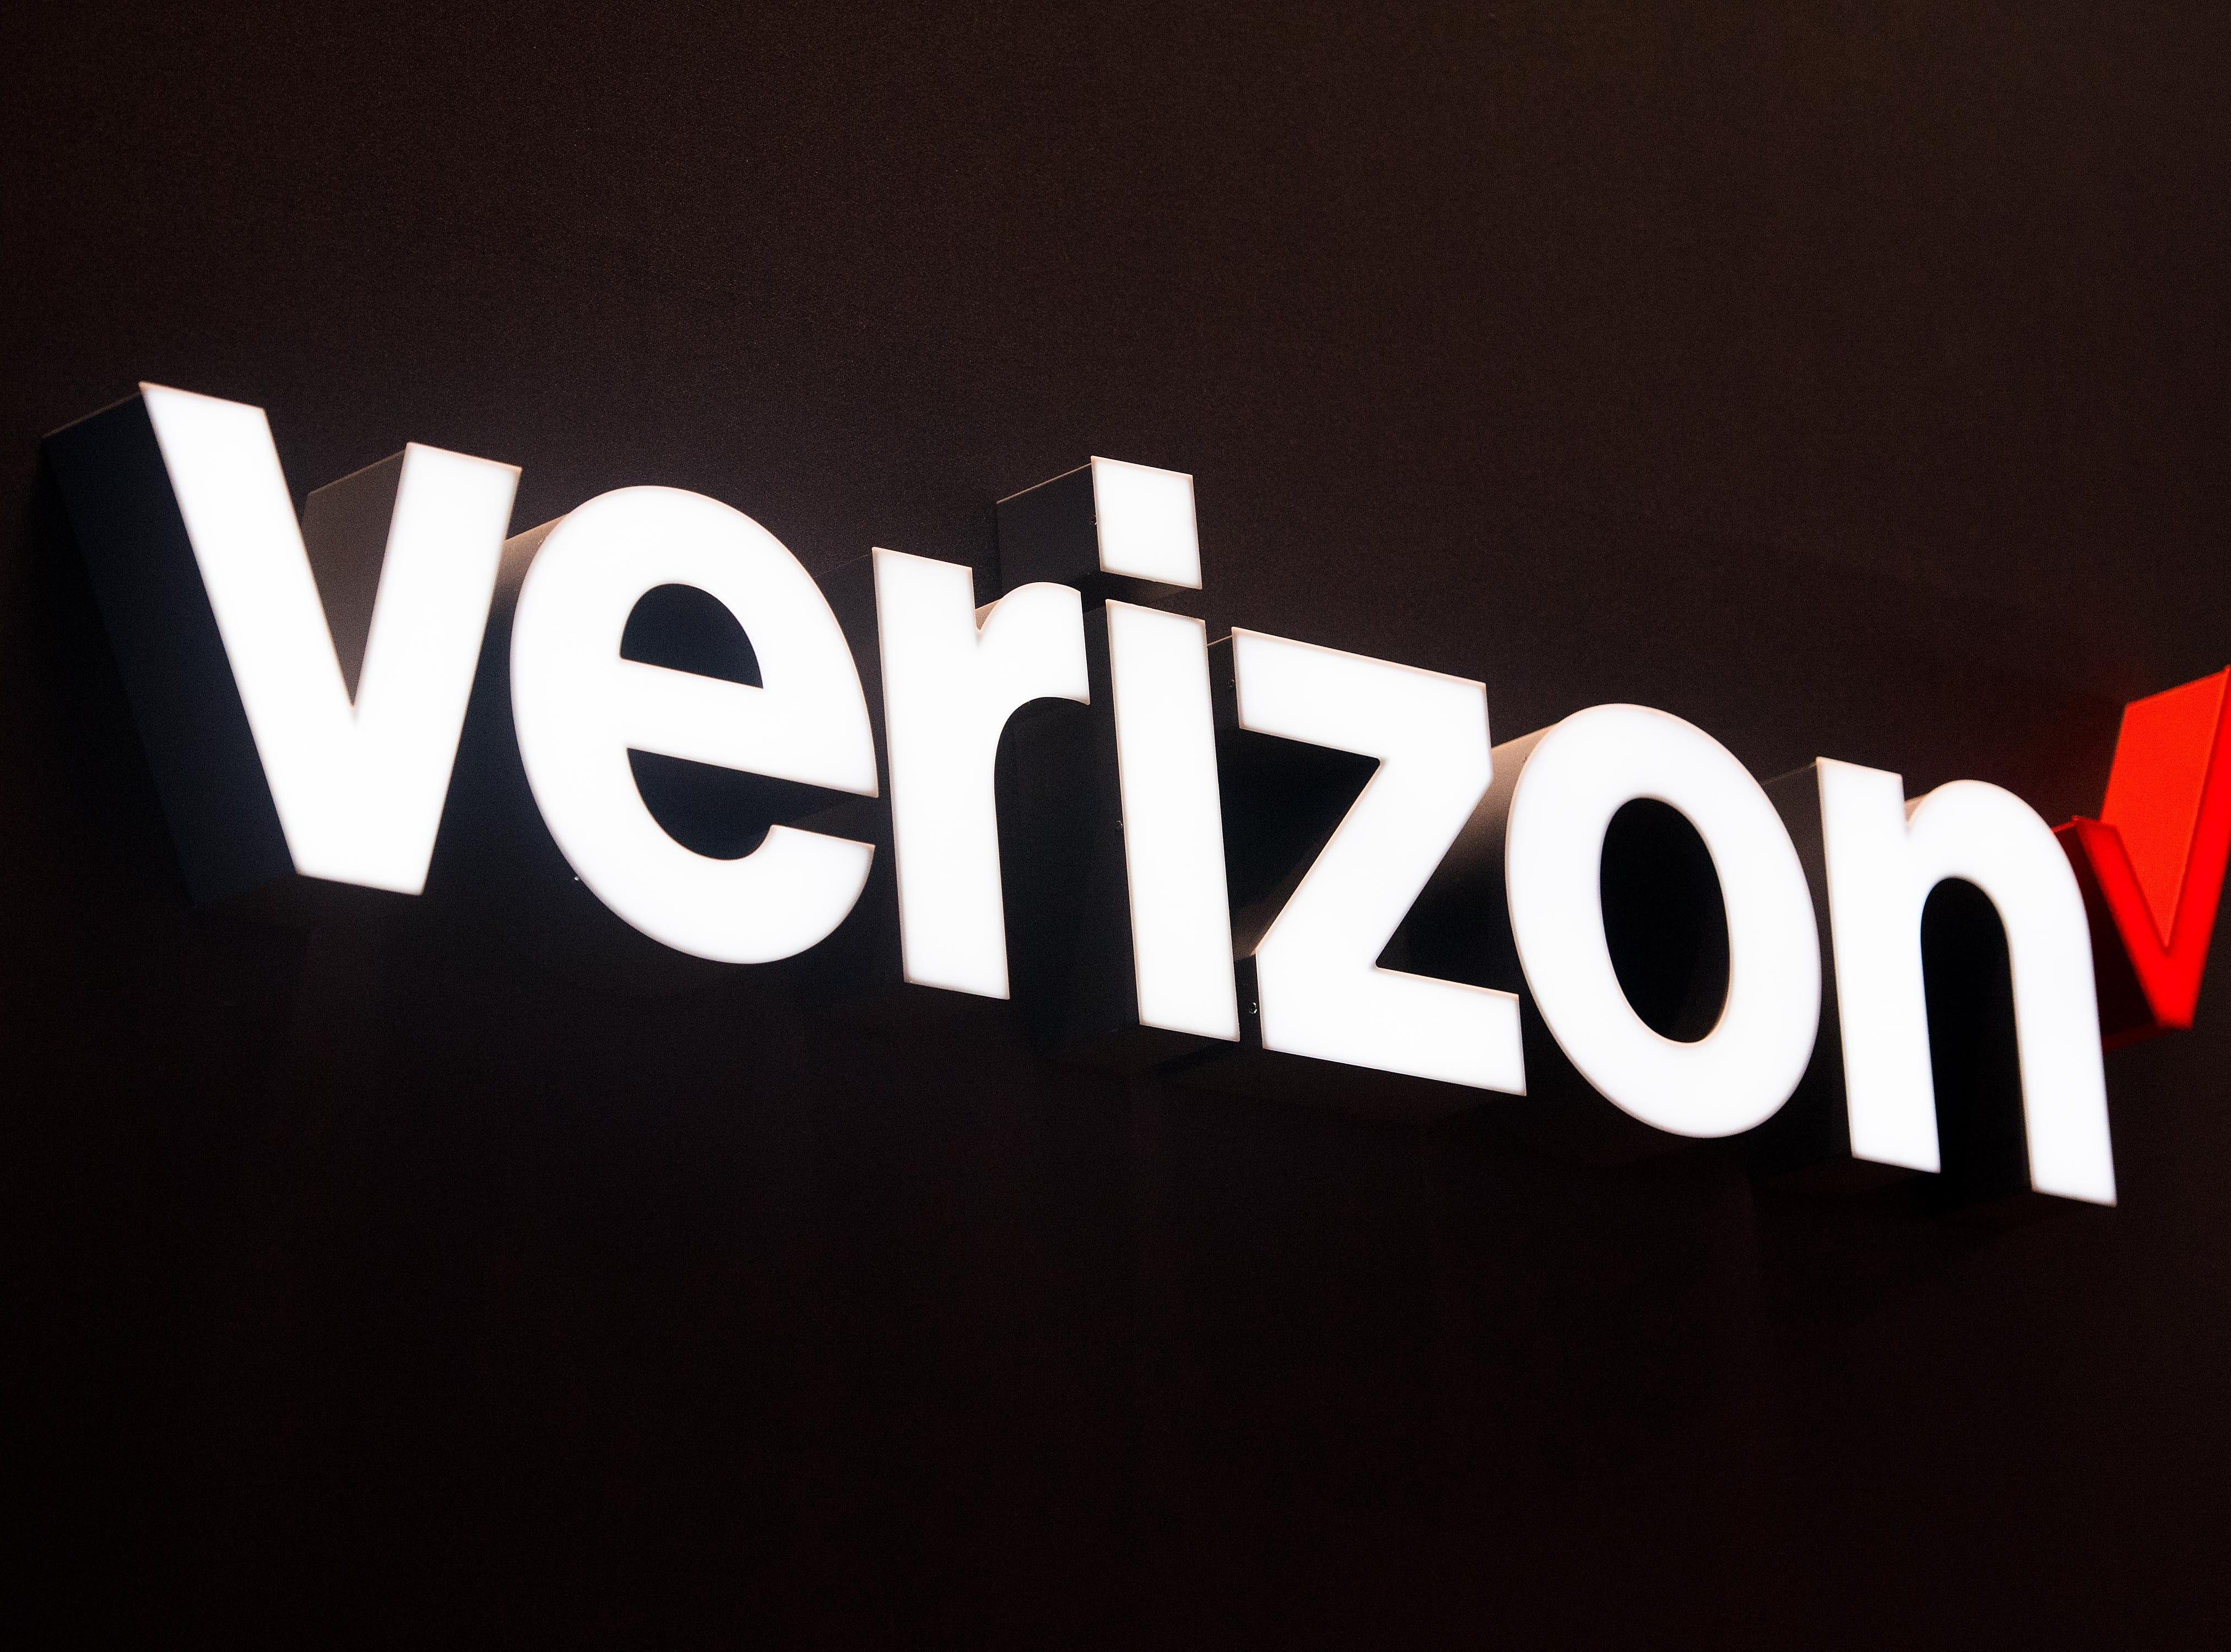 No. 65: Verizon Communications Inc. | Wireless communications| 2019 employees: 2,820 | 2018 employees: 2,820 | Ownership: Public | Headquarters: New York | www.verizon.com